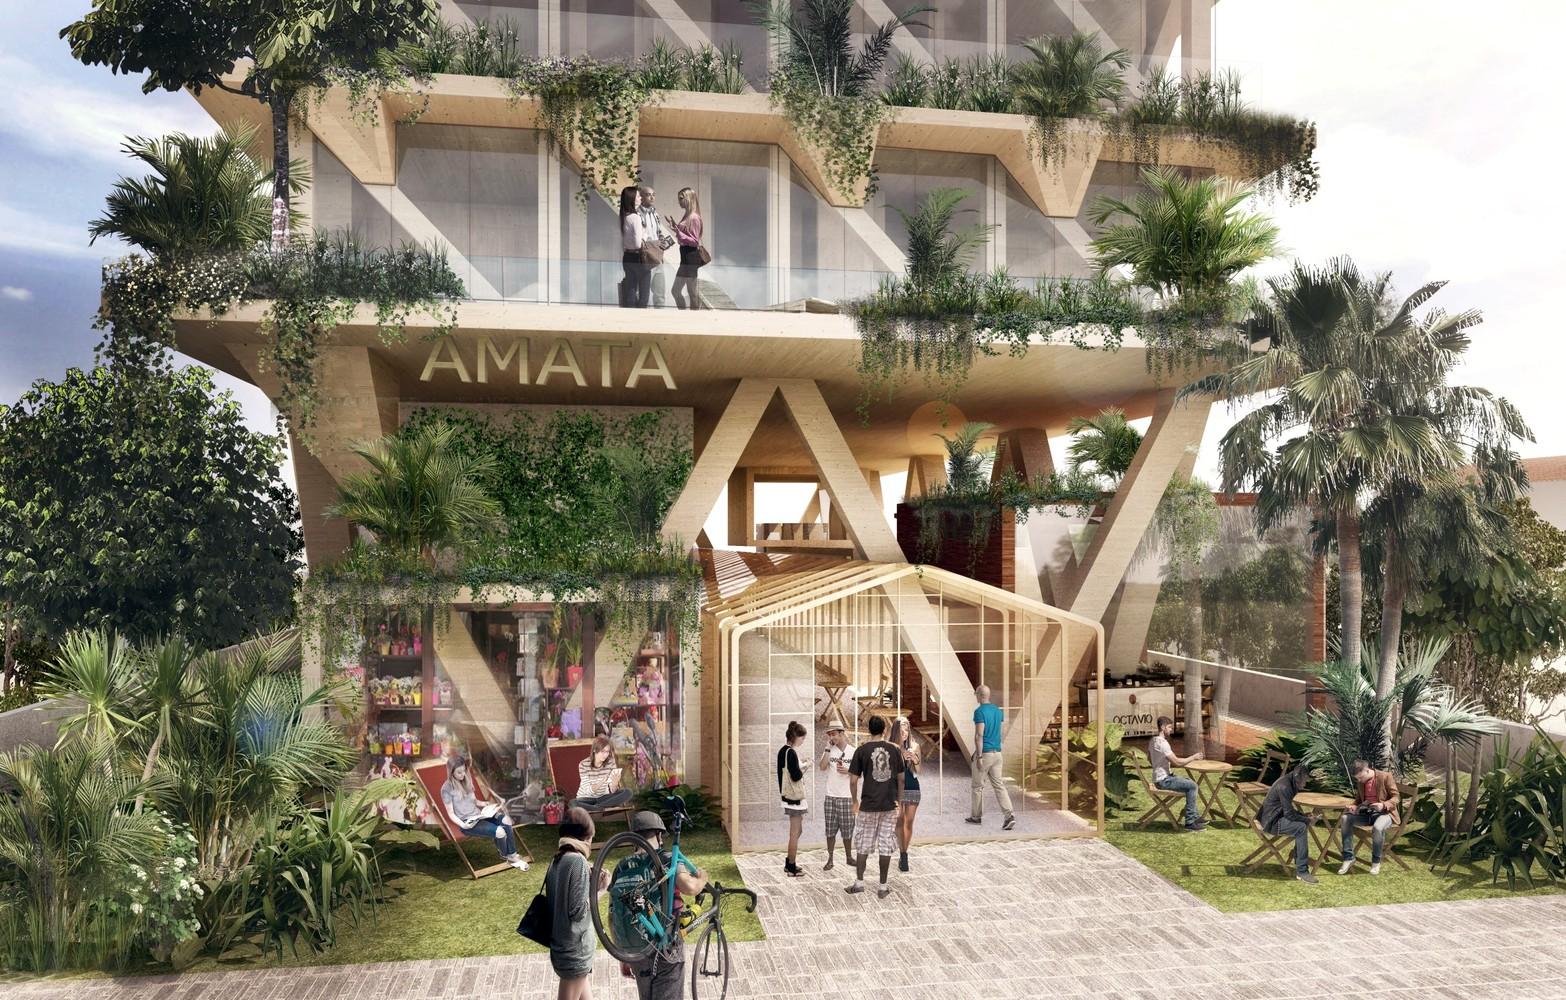 Triptyque divulga projeto de edifício escalonado de madeira certificada na Vila Madalena,Cortesia de Triptyque